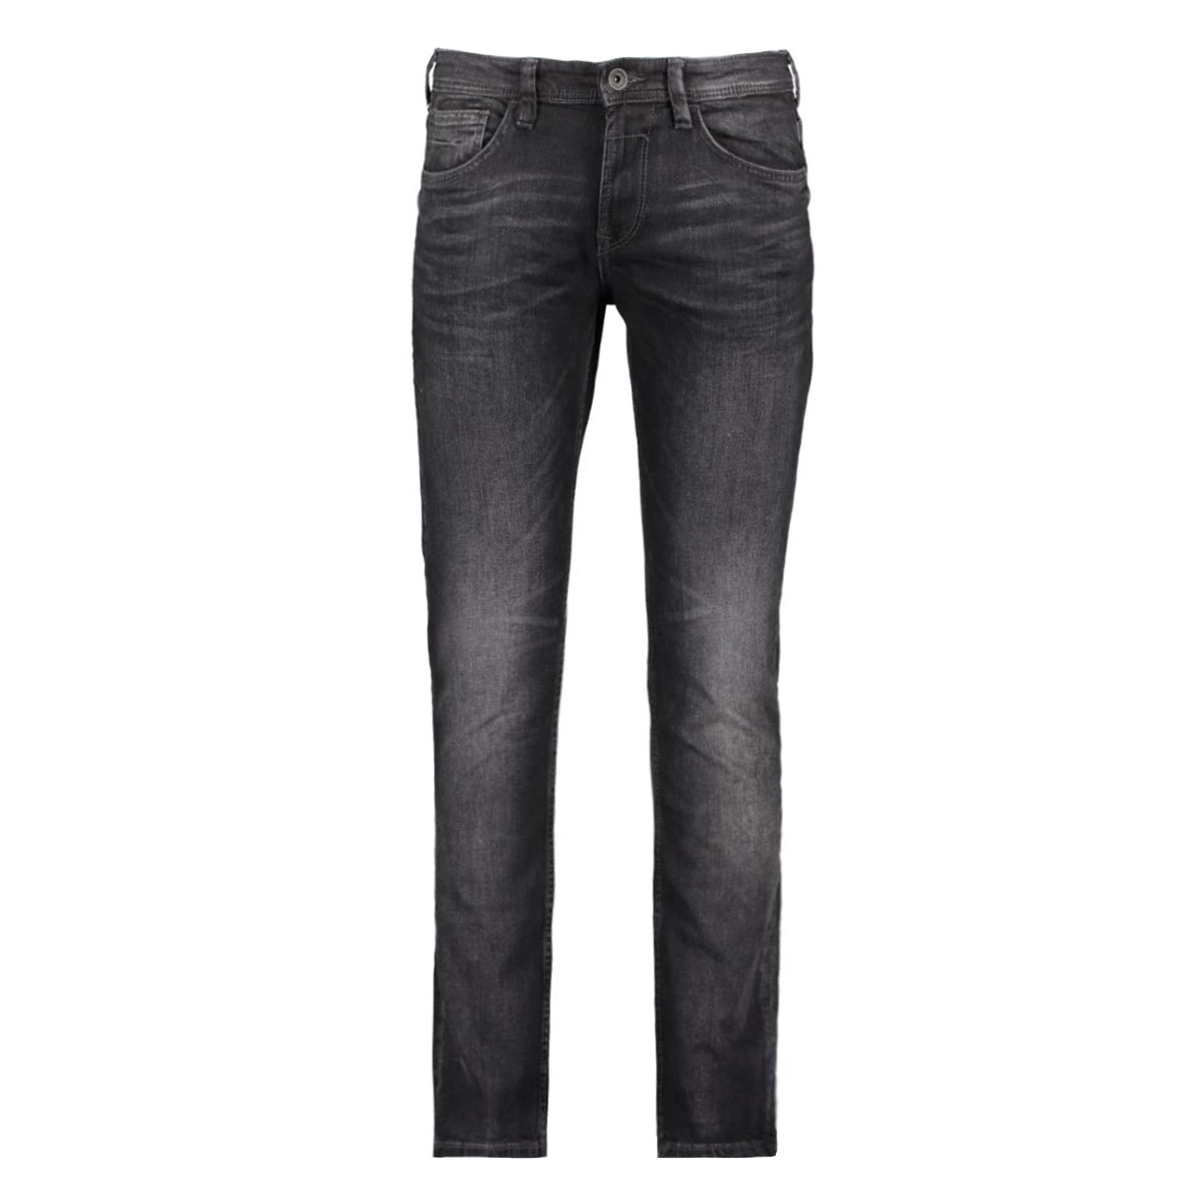 6205286.09.12 tom tailor jeans 1057